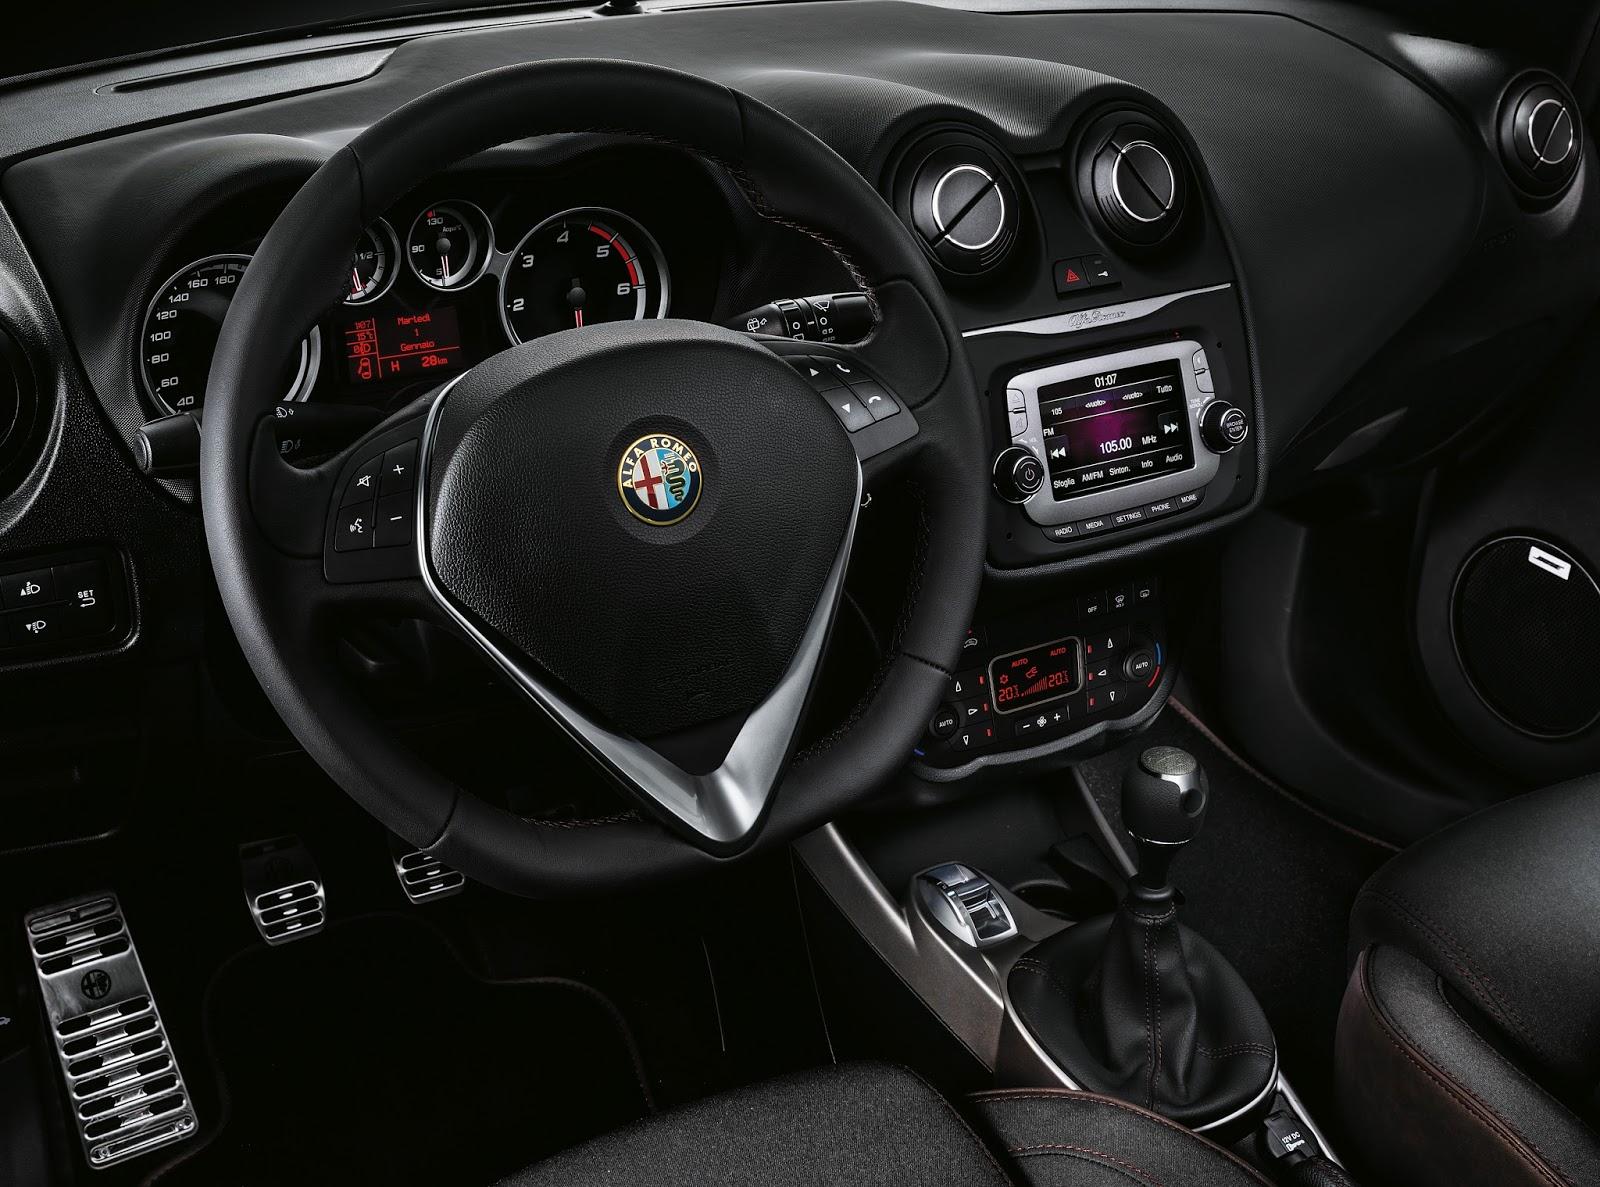 150223 AR MiTo Racer 04 Νεα ειδική έκδοση Alfa Romeo MiTo Racer: Από 15.820 ευρώ alfa romeo, Alfa Romeo MiTo Racer, MiTo, MiTo Racer